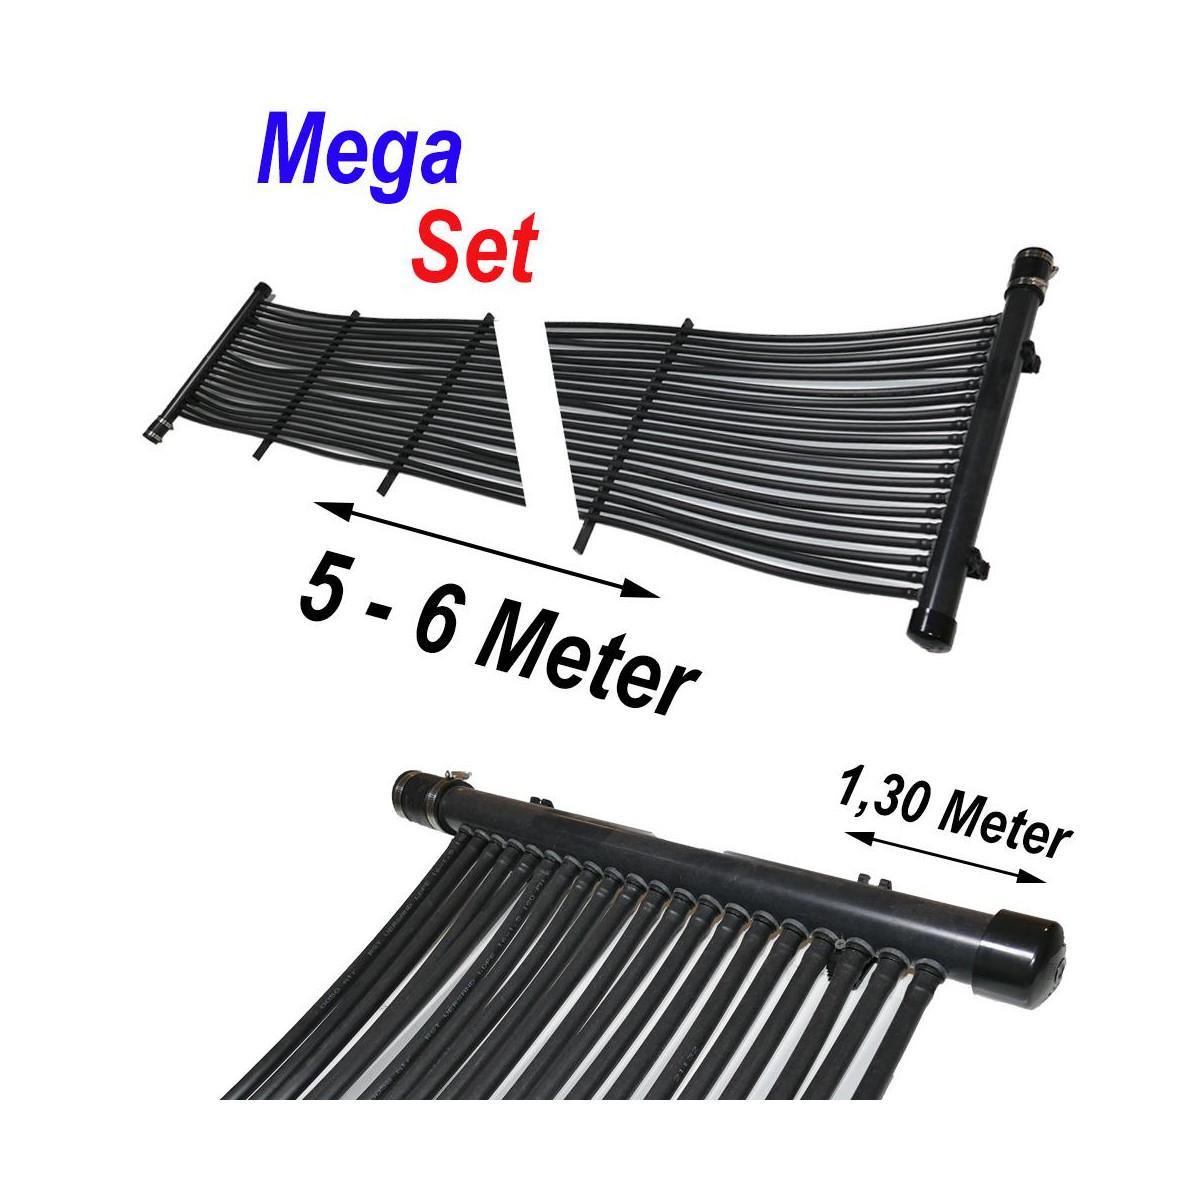 RST-VERSAND (Eigenmarke) Poolheizung Solarmatte MegaSet 7,20 m² (240 Meter)